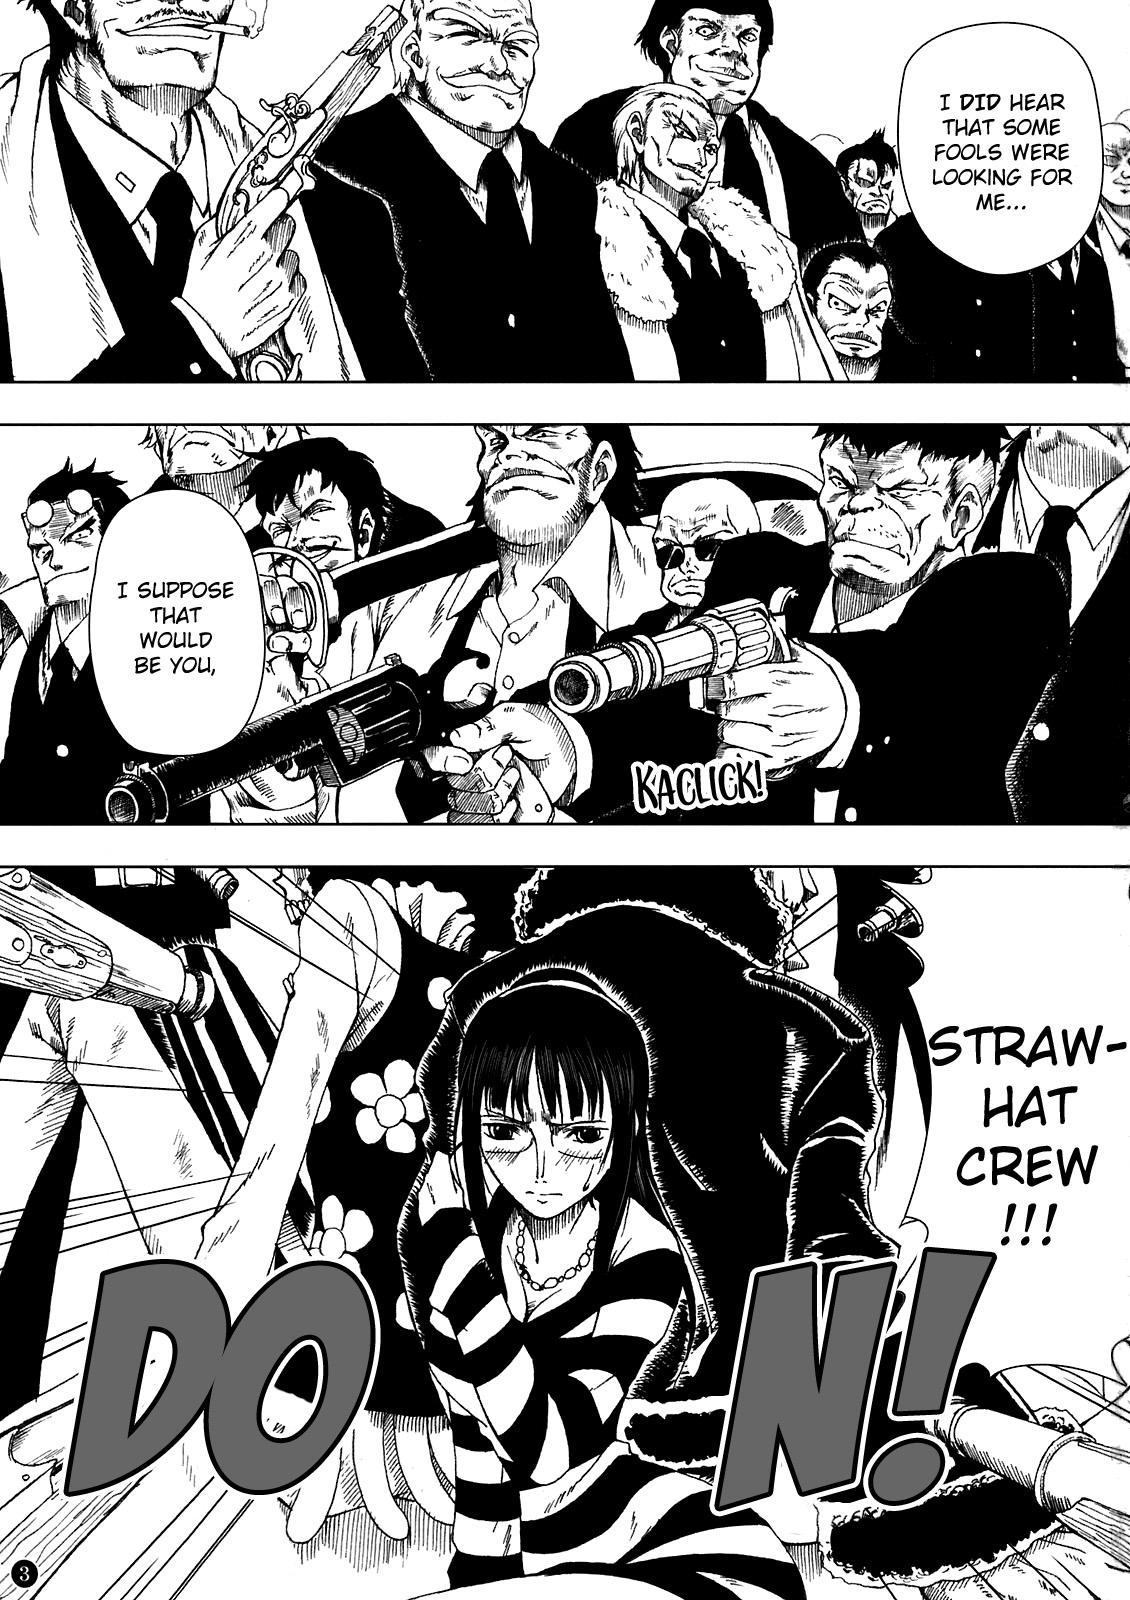 Akuma no Mi no Tsukaikata | The Use of Devil Fruits 3